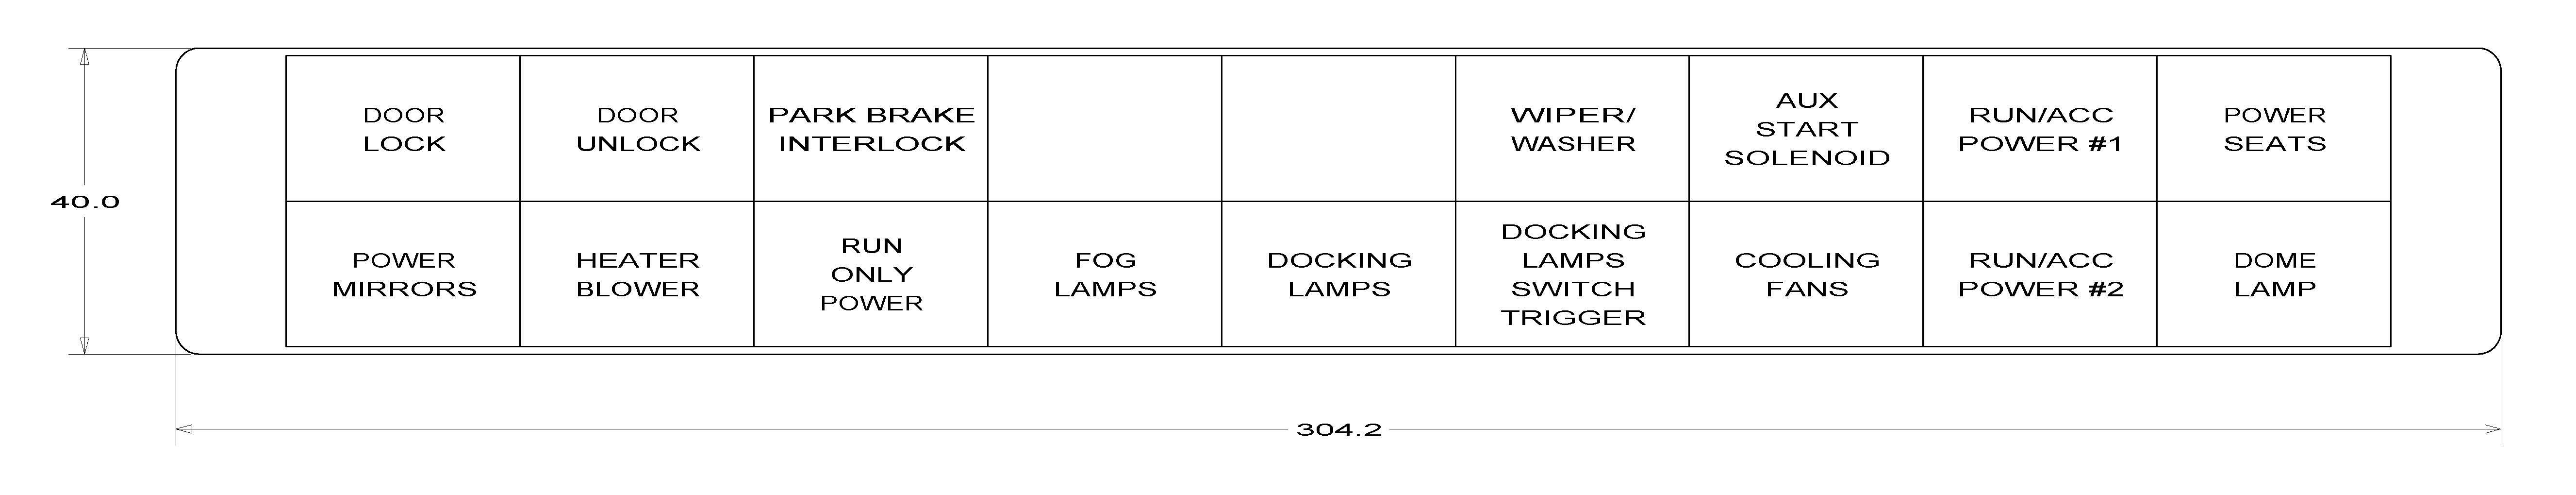 Front End Wiring 18557602000. Wiring. Winnebago Wiper Motor Wiring Diagram At Scoala.co